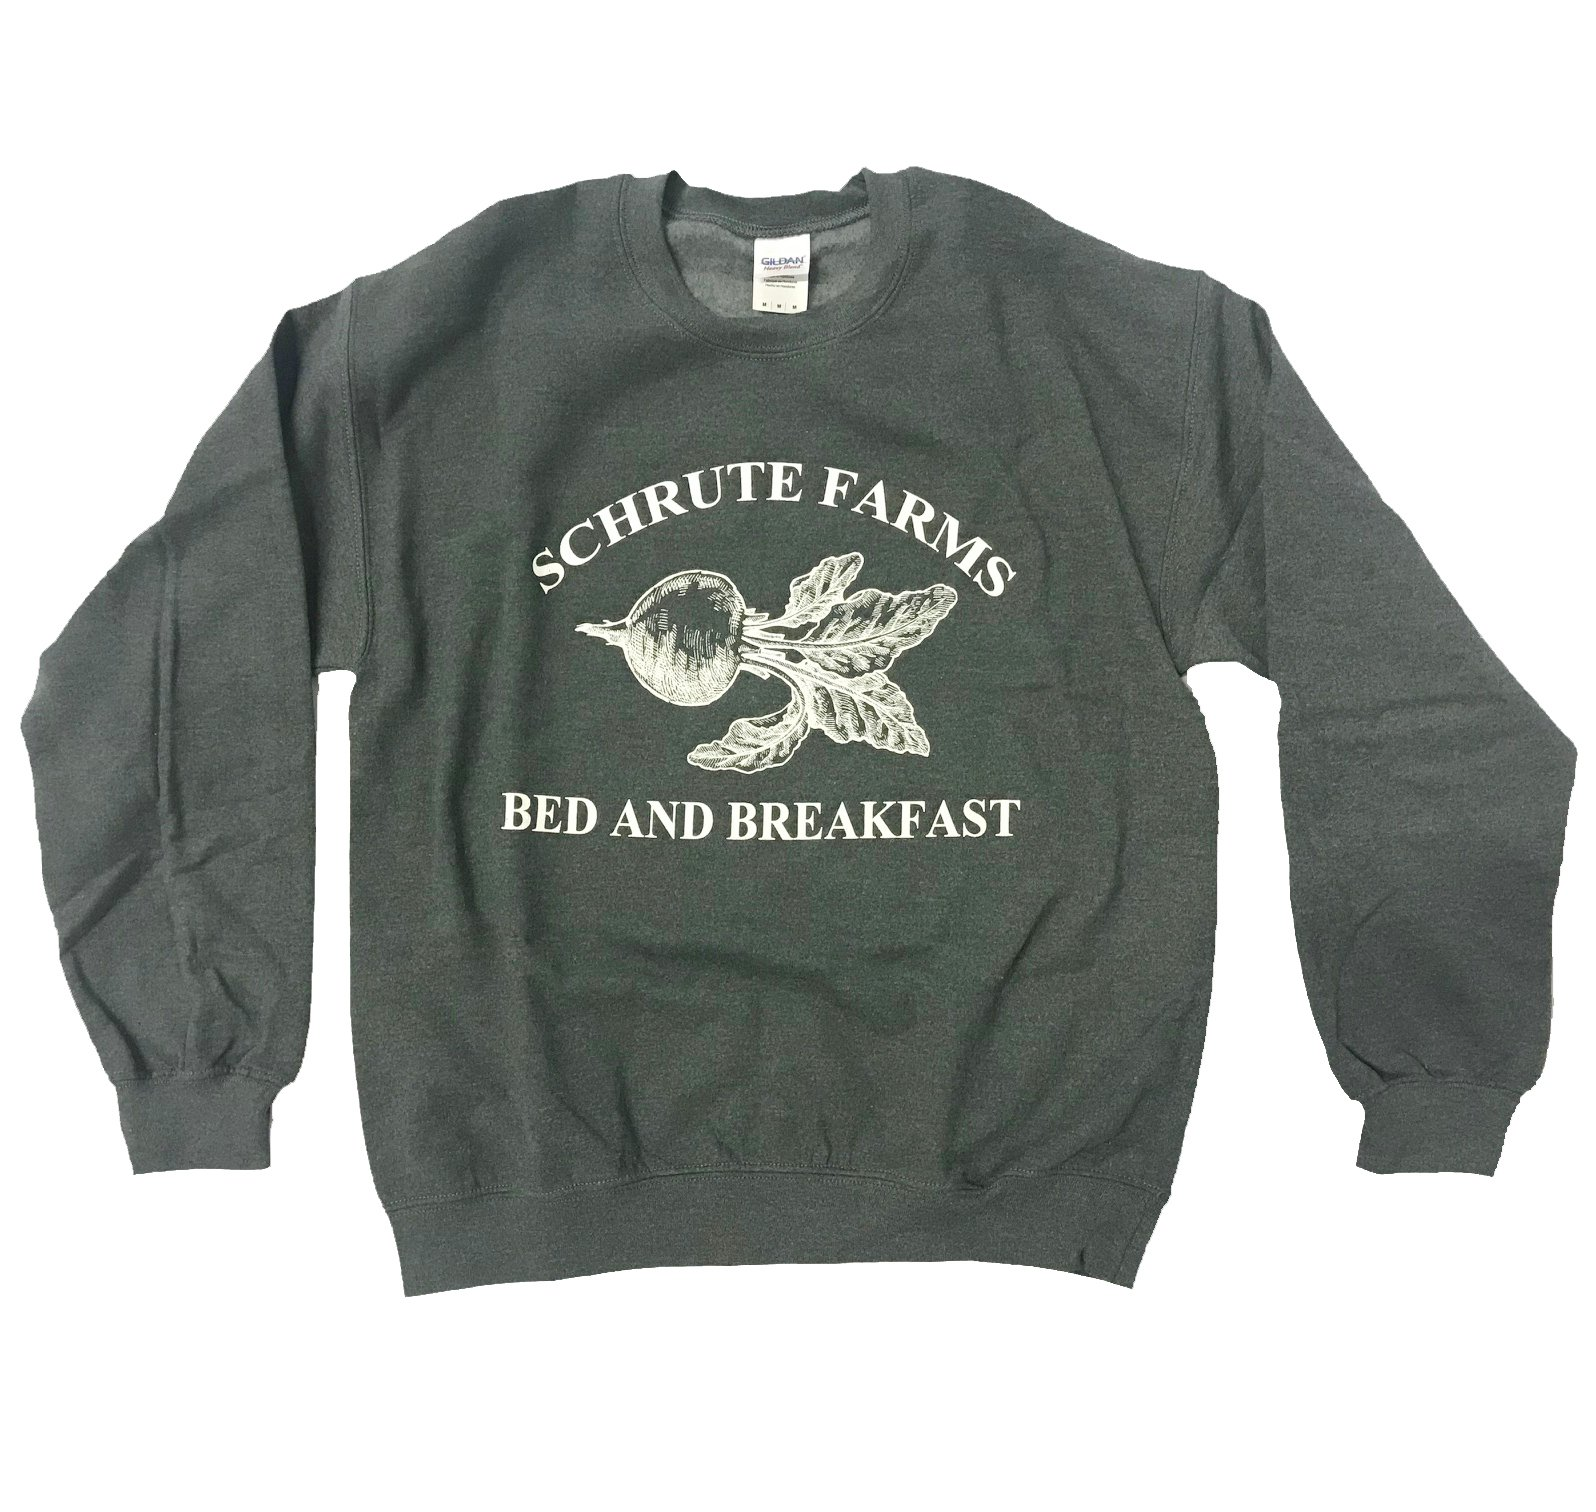 256acf54e iApparel Schrute Farms Bed and Breakfast Dark Heather Grey Men Sweatshirt  (Large)